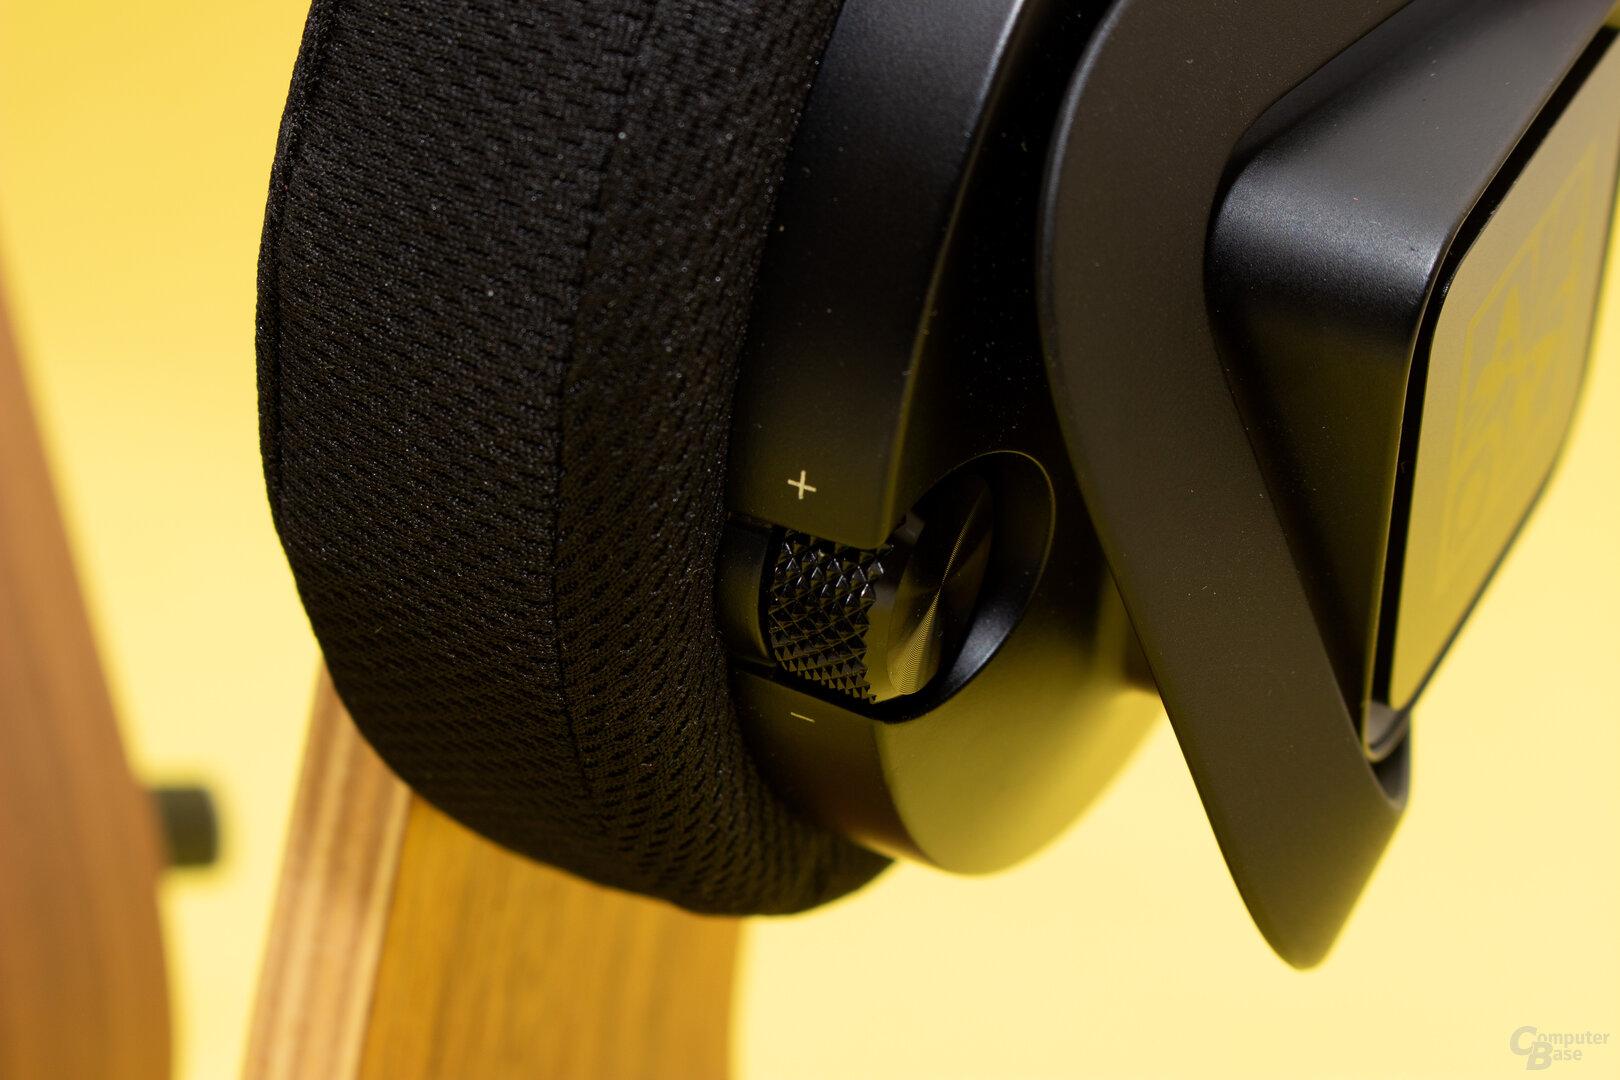 Der Lautstärkeregler als einziges Bedienelement am Headset